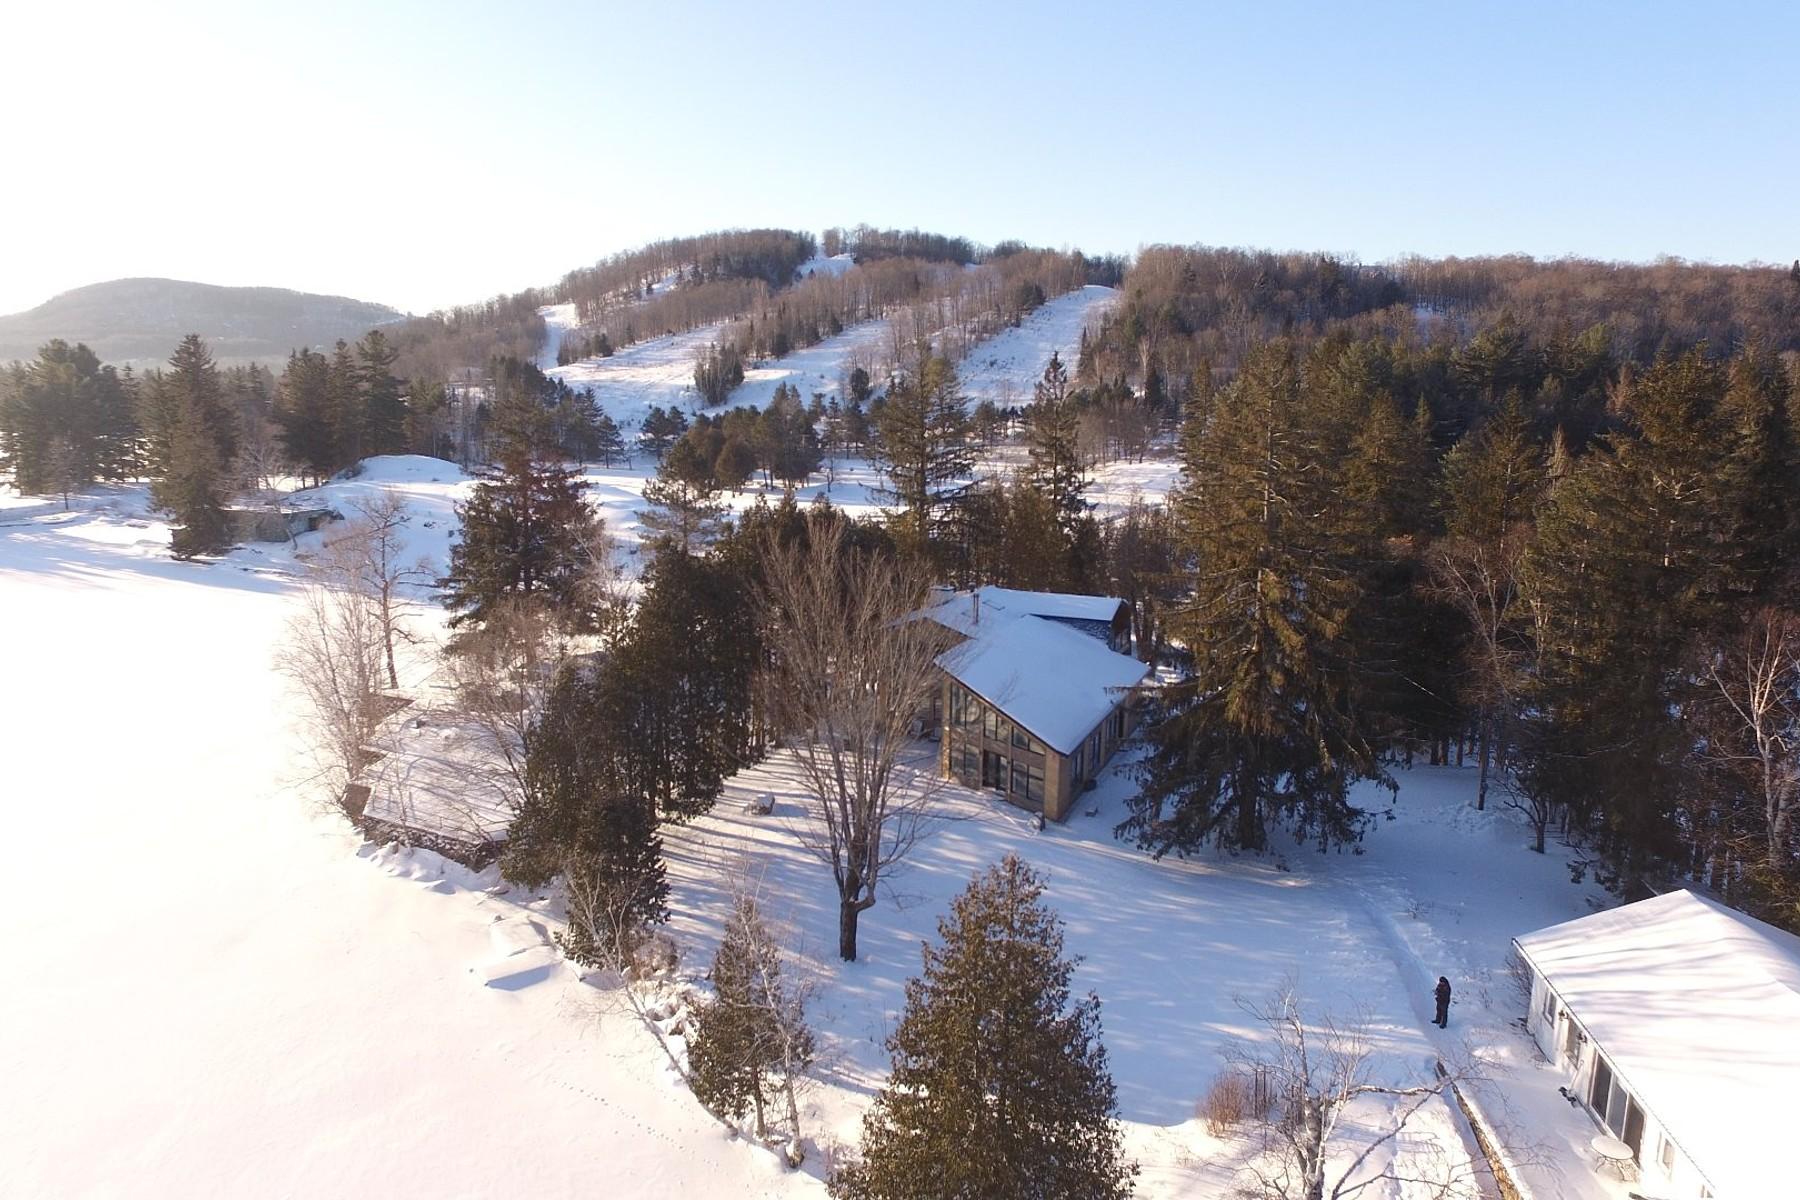 独户住宅 为 销售 在 Mont-Tremblant, Laurentides 130 Ch. Dorken 塔伯拉, 魁北克省, J8E1Y2 加拿大